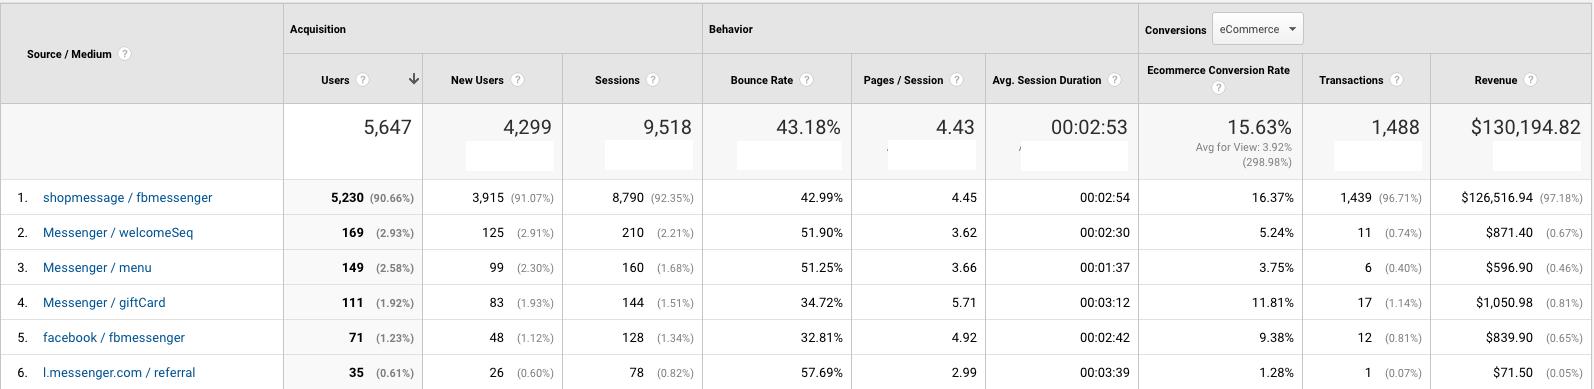 Facebook Messenger marketing conversion rates